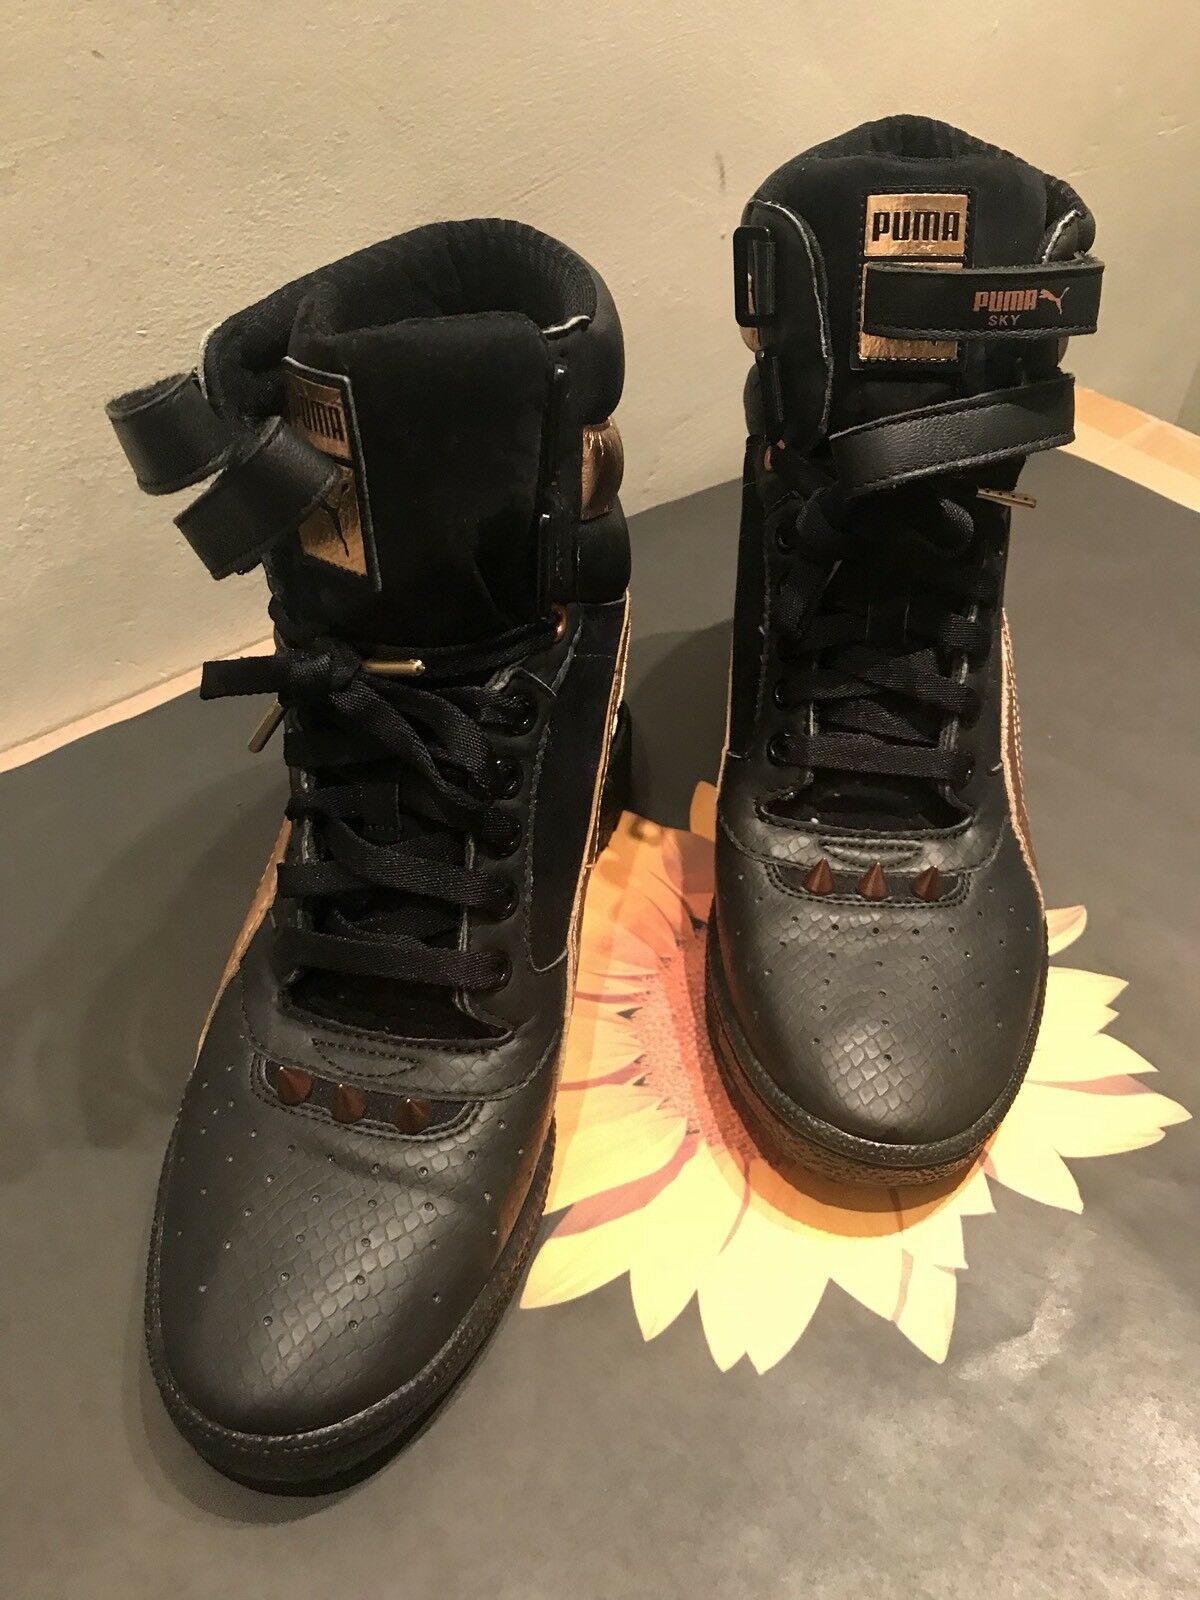 Women's Black Puma Sky Wedge Spikestud Hidden Wedge Hightop Sneaker